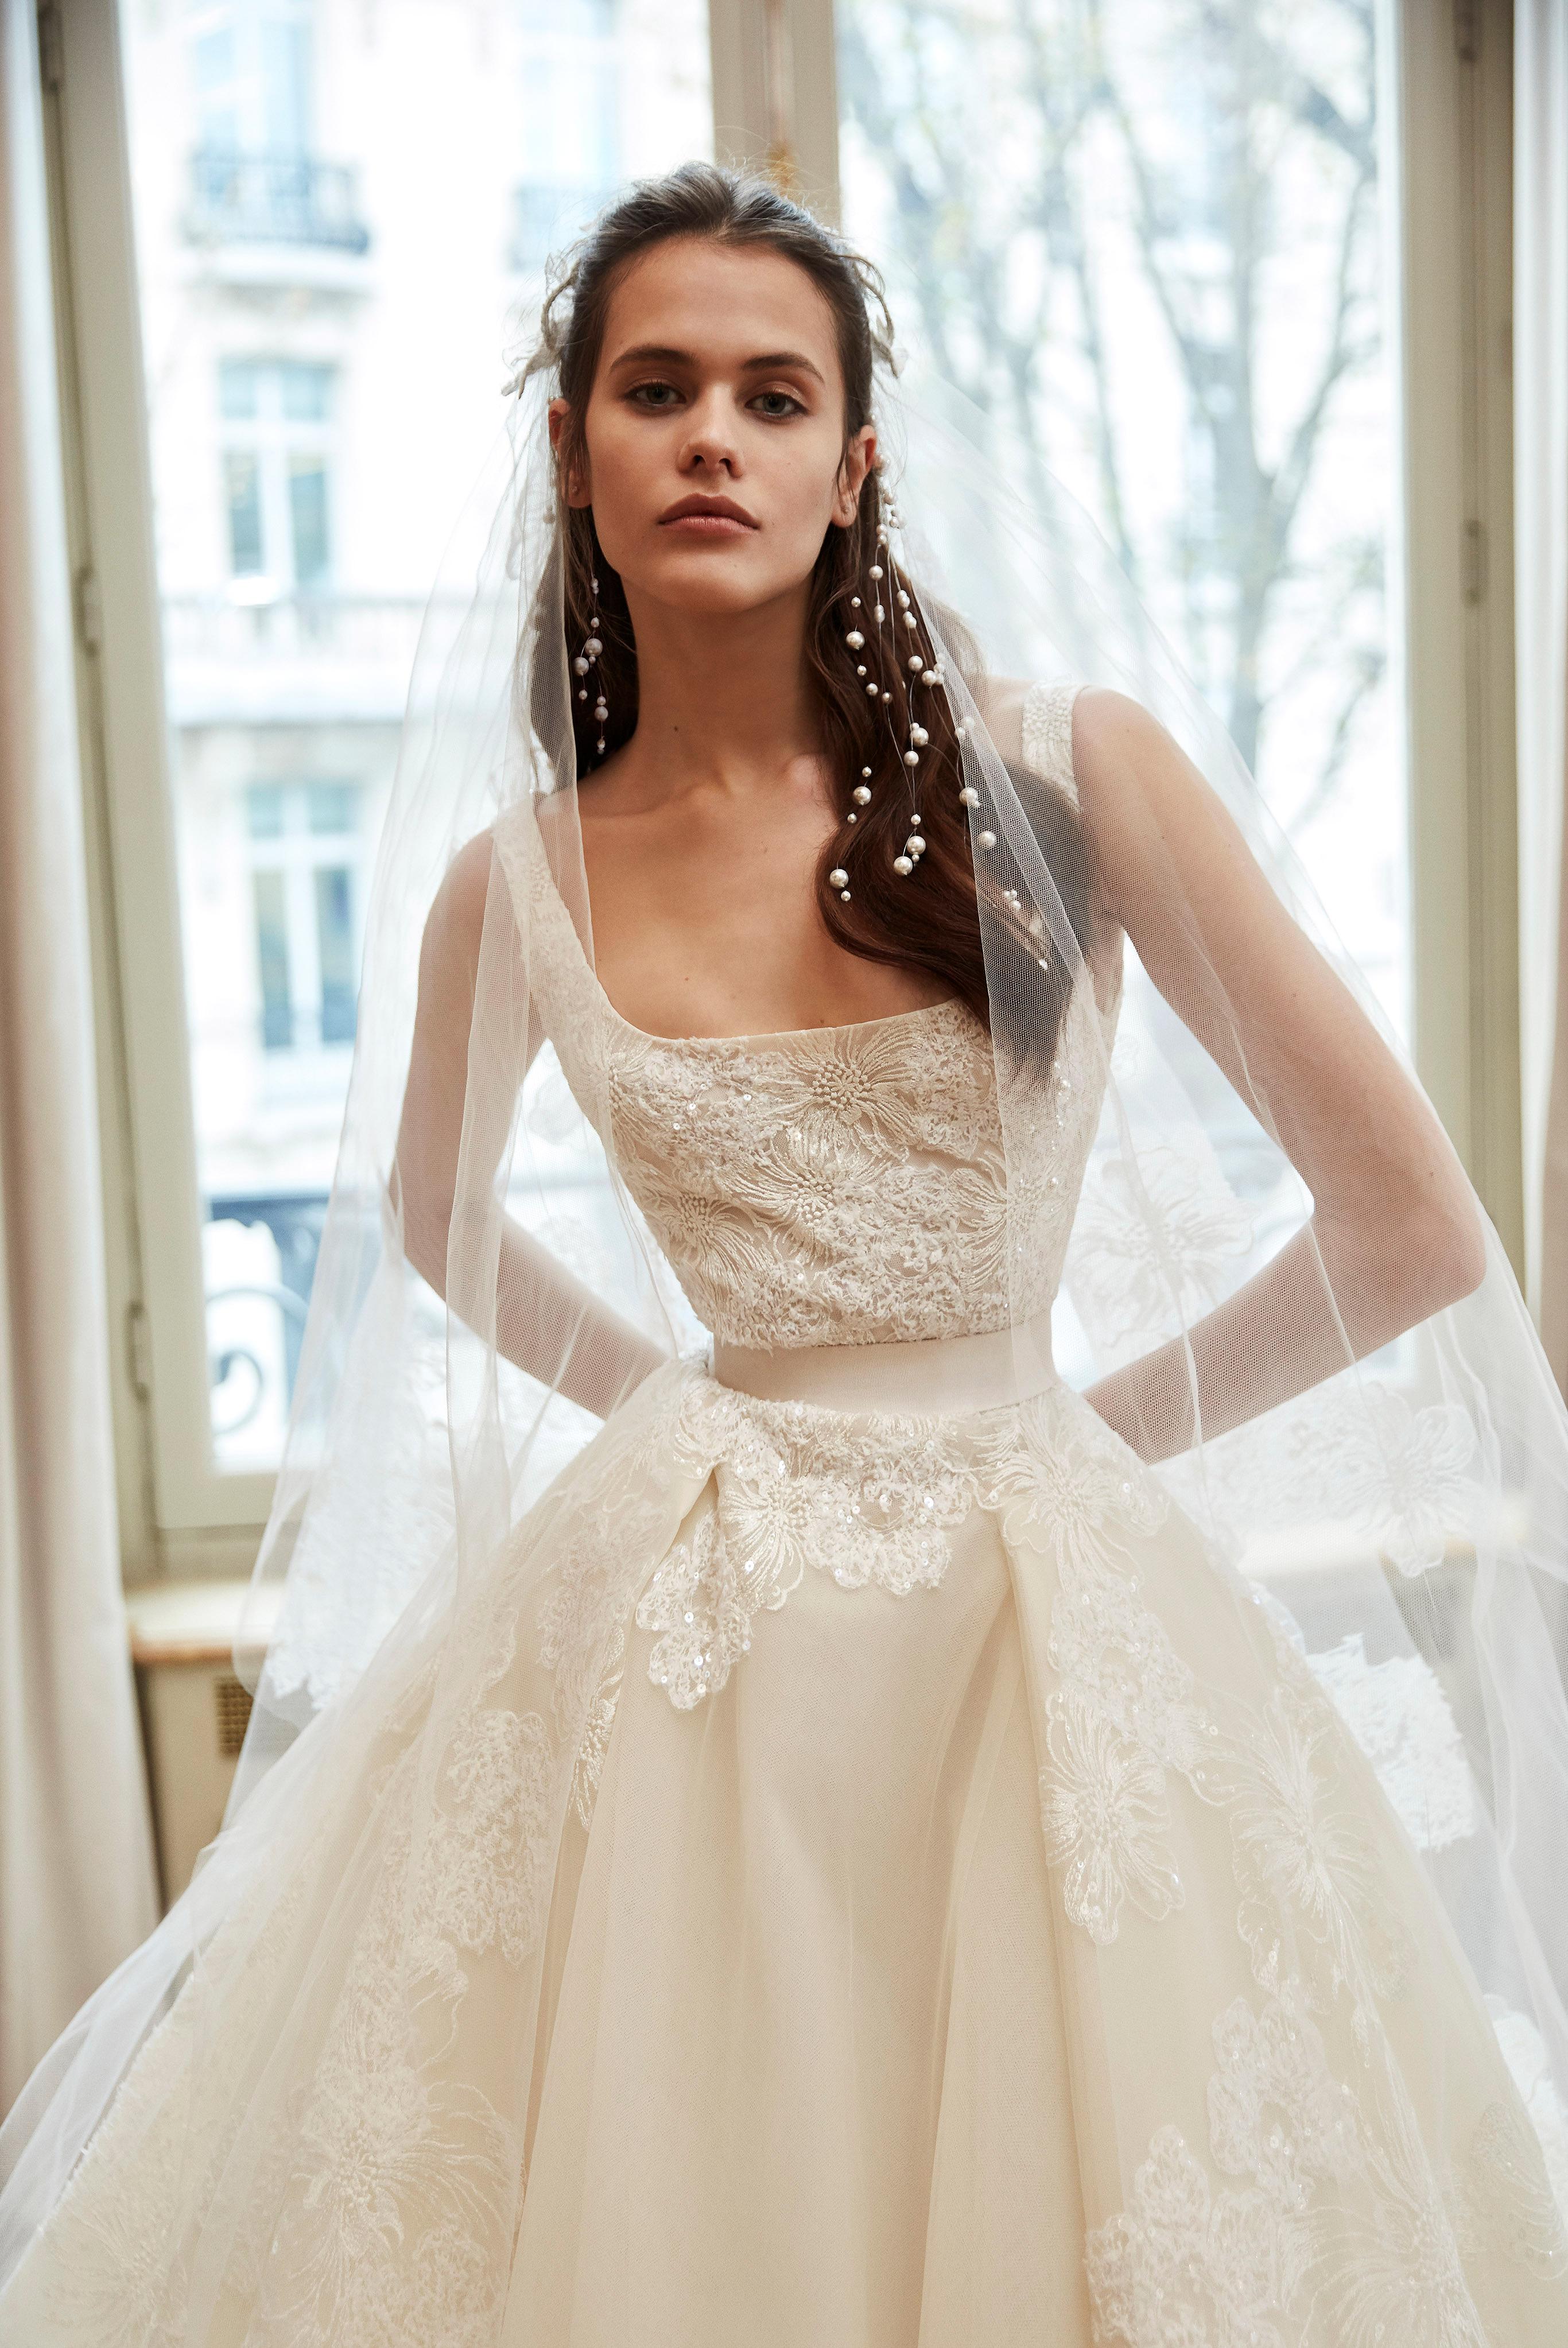 elie saab wedding dress spring 2019 sleeveless a-line embroidery